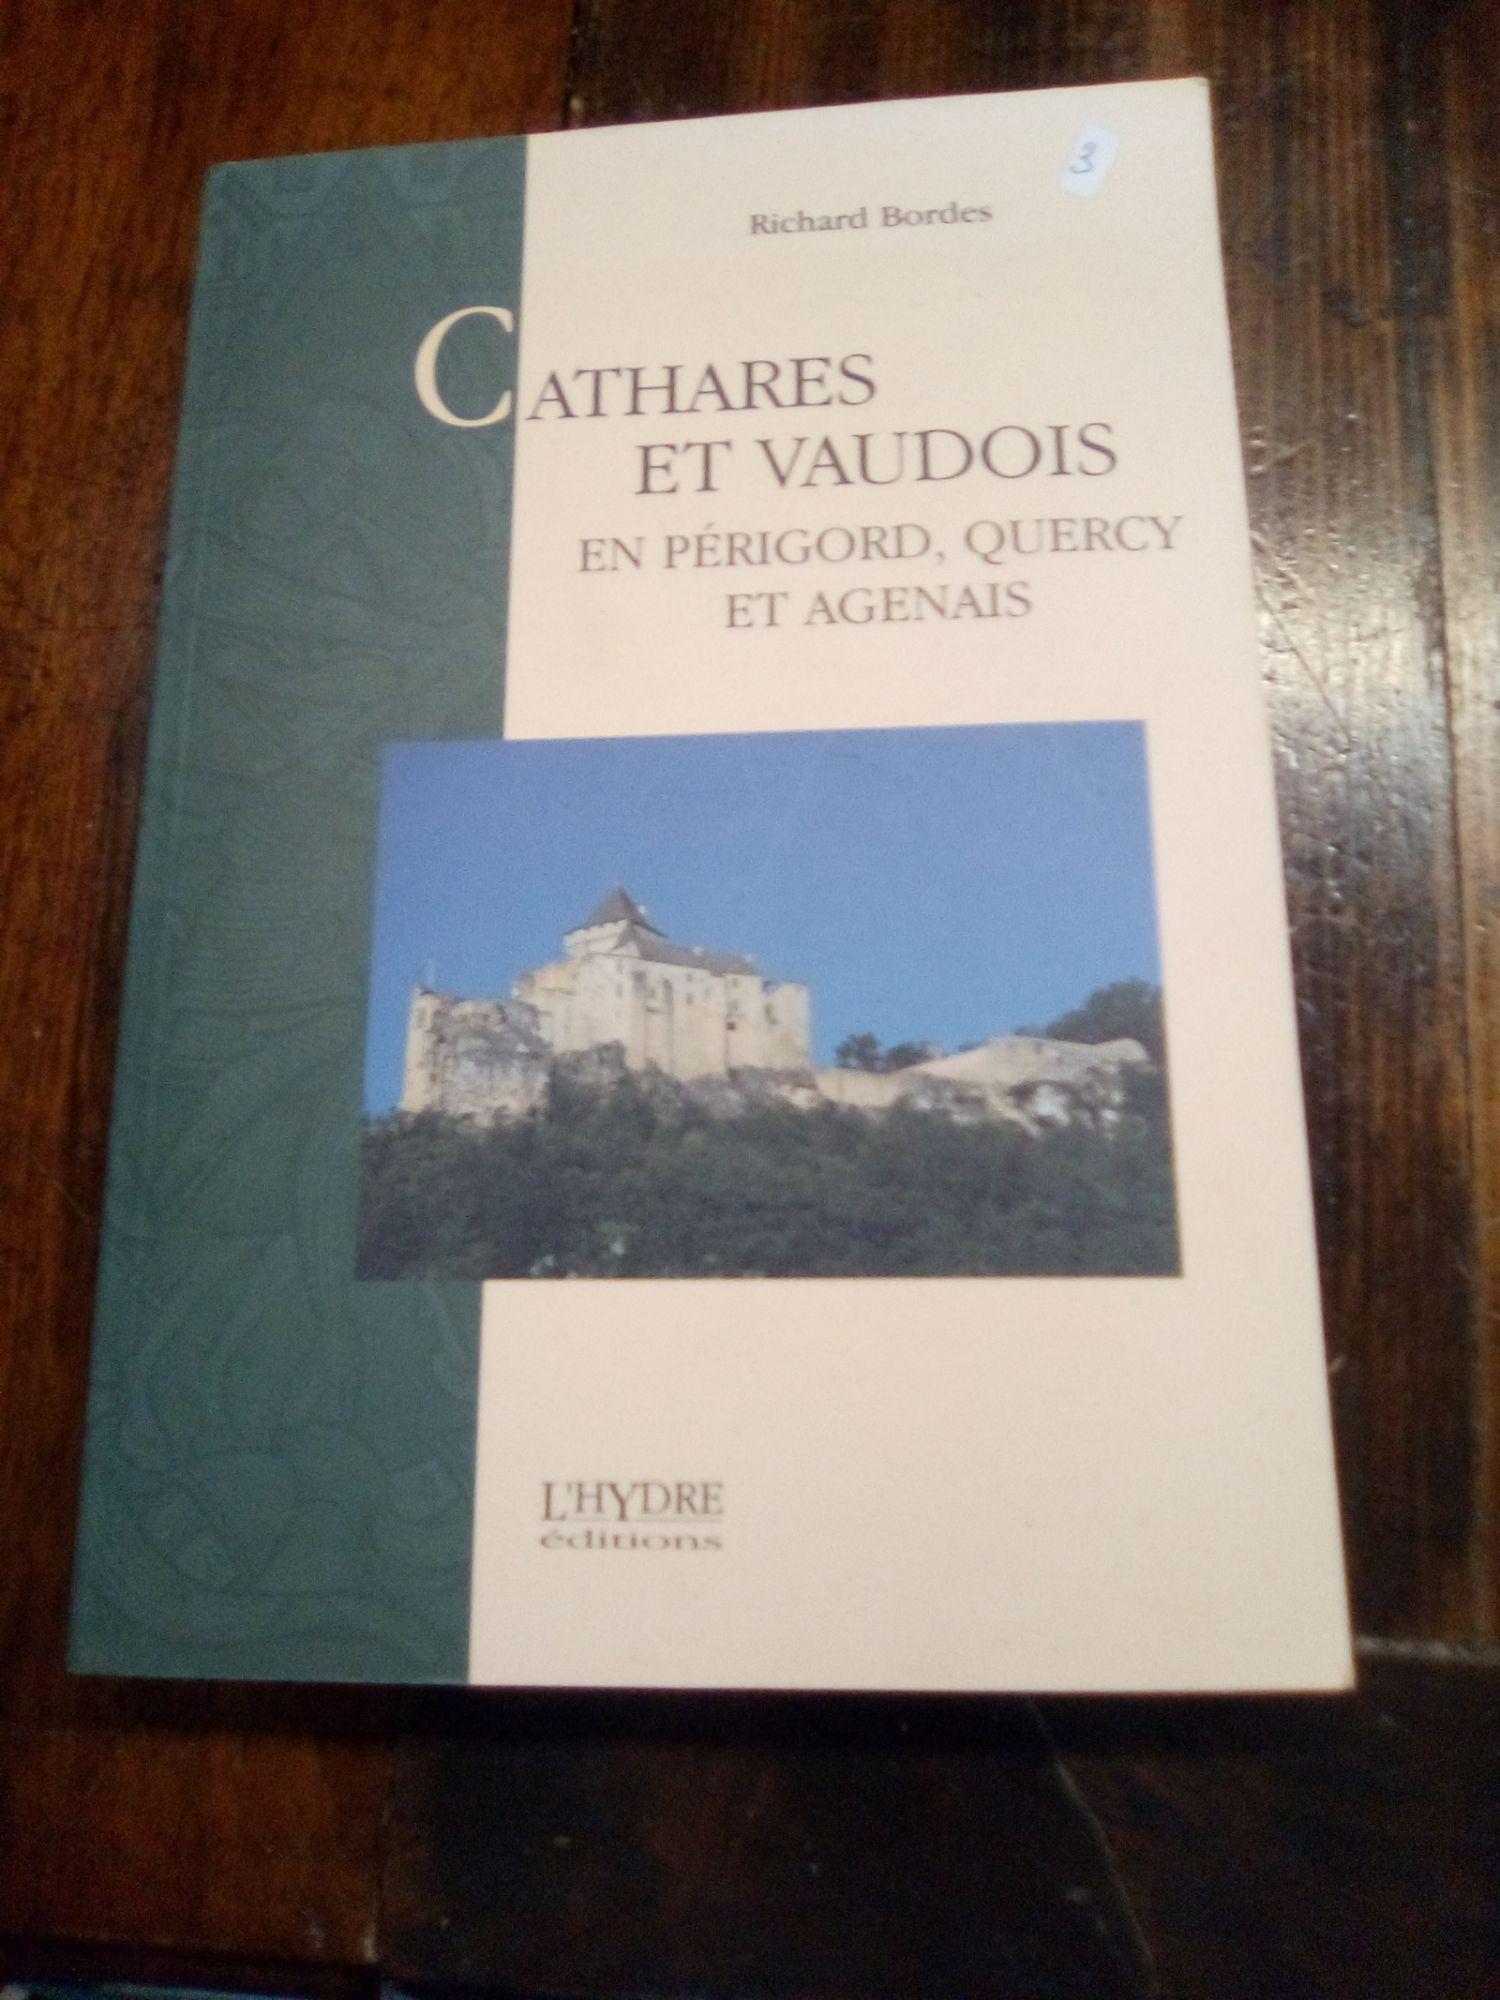 Cathares et vaudois en Périgord, quercy et agenais